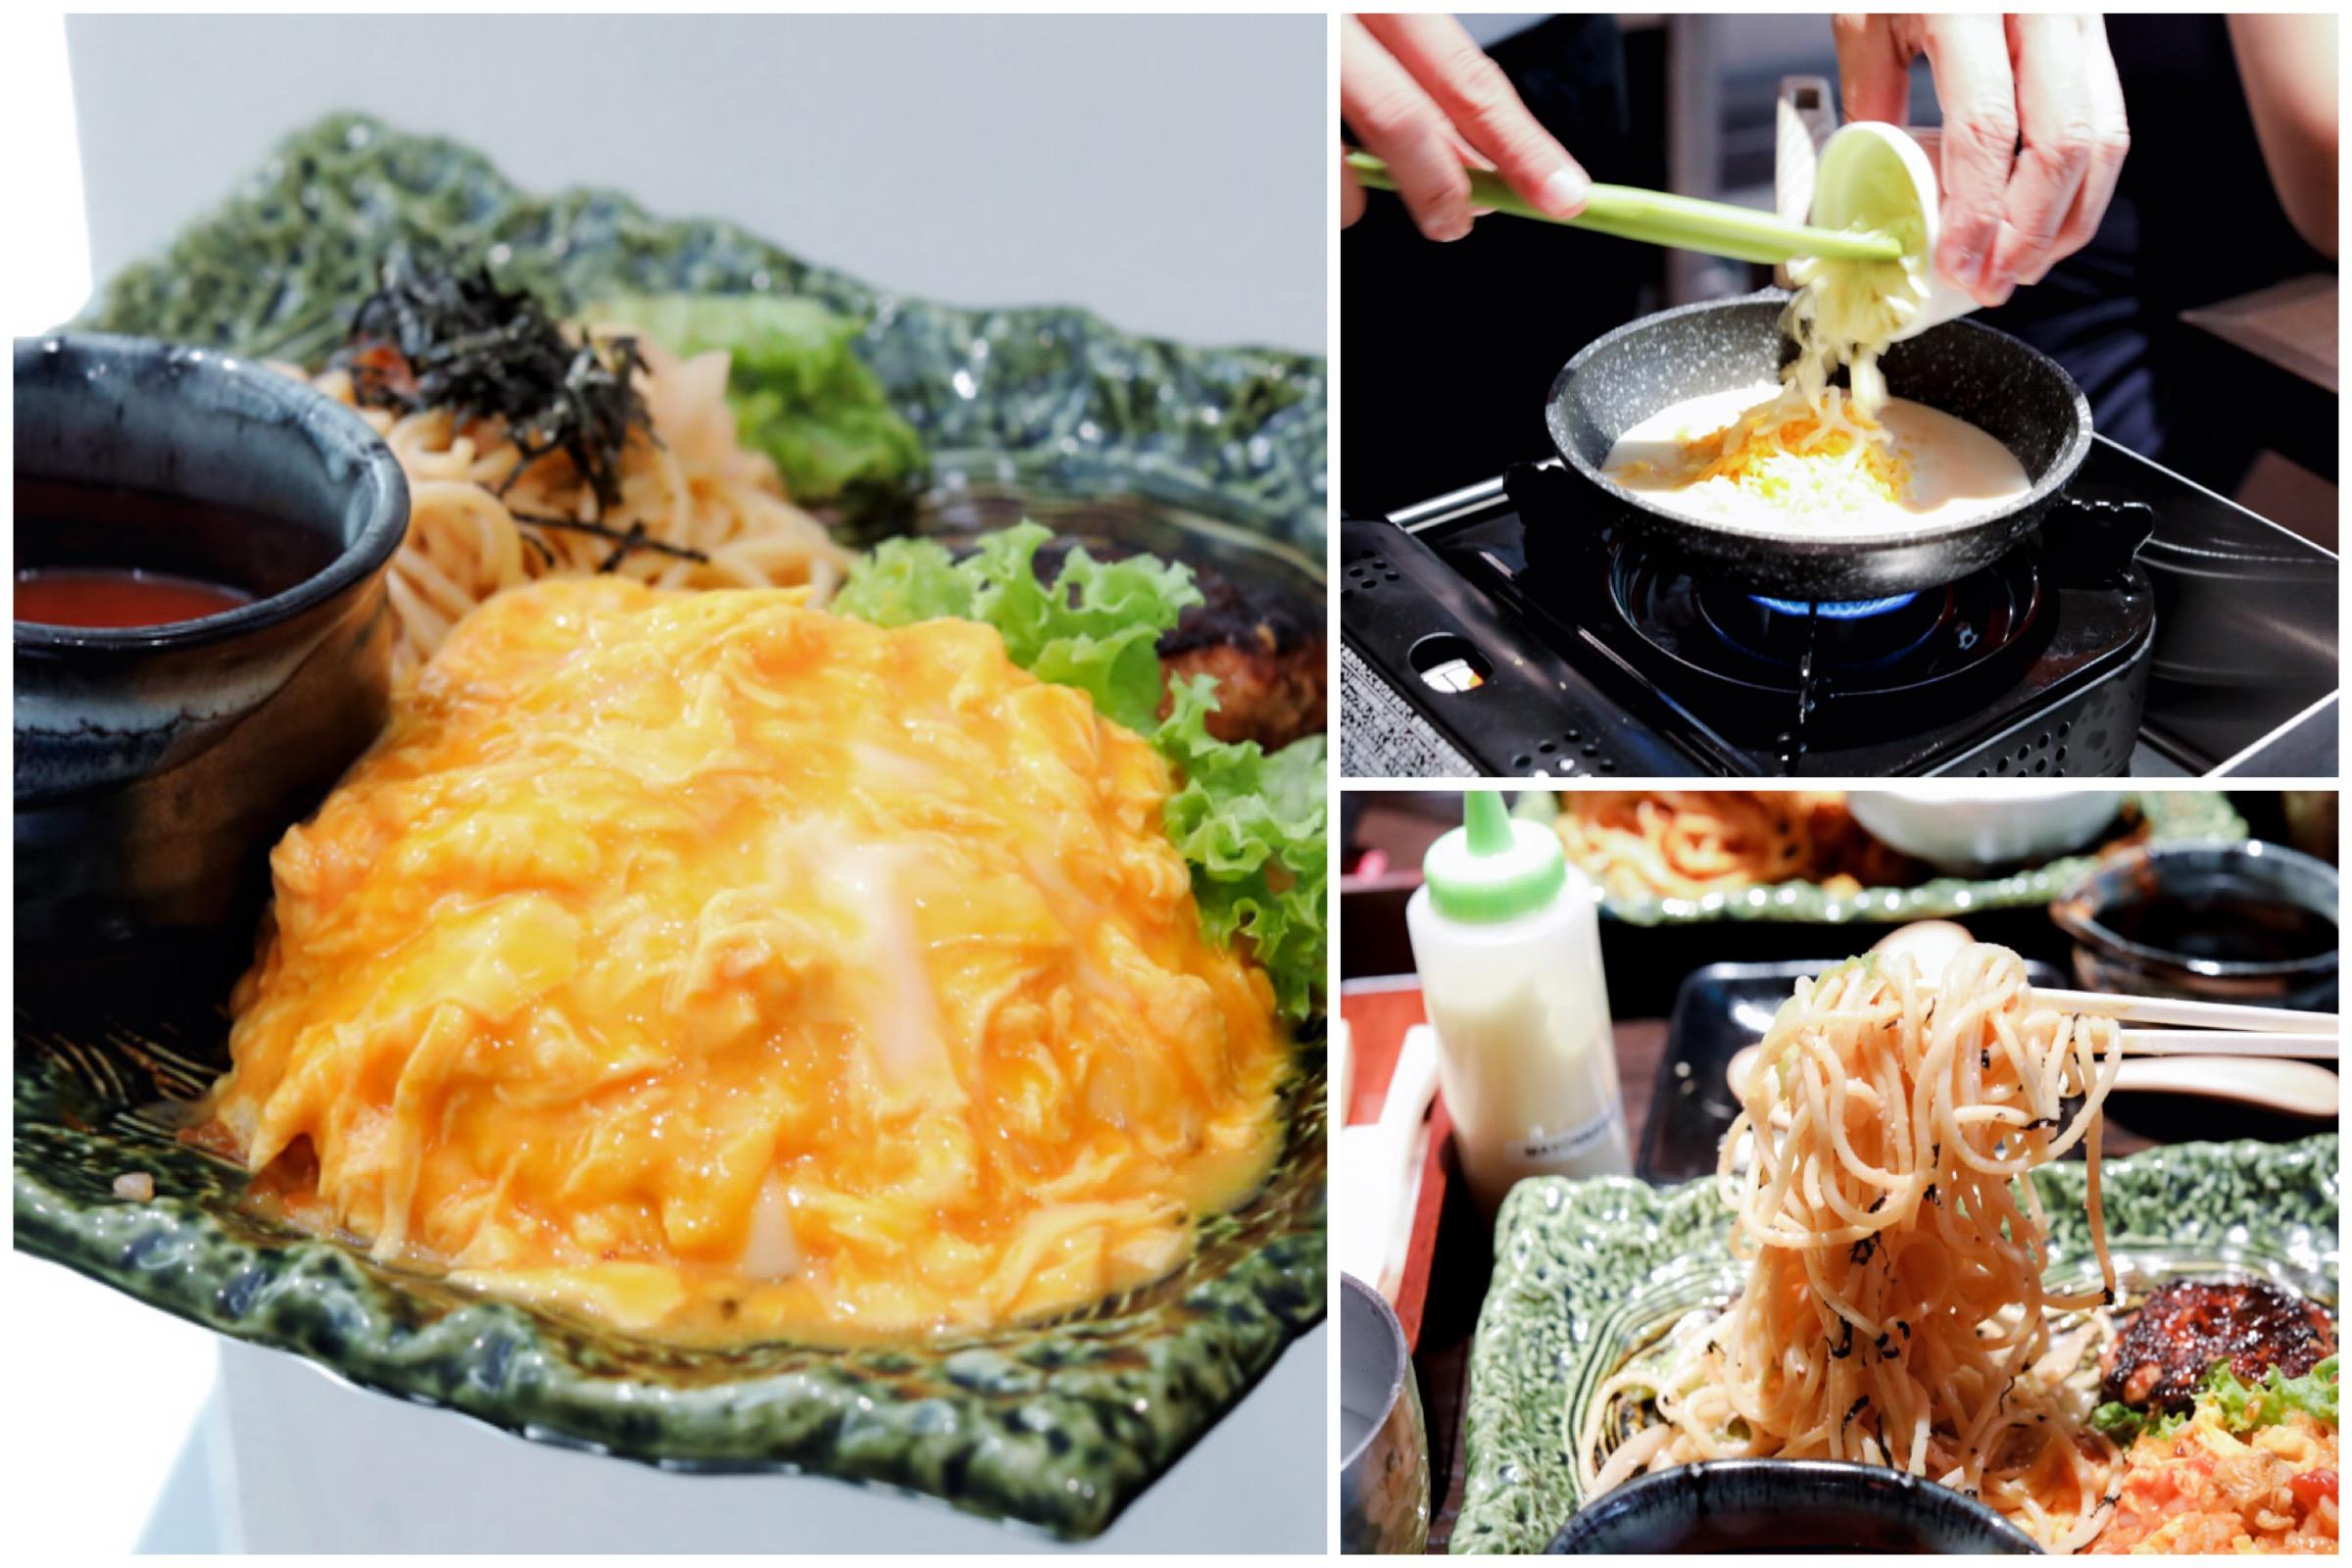 Omurice Keisuke - $9.90 Omurice with FREE Upsize, $12.90 Set With Spaghetti. At Bugis+